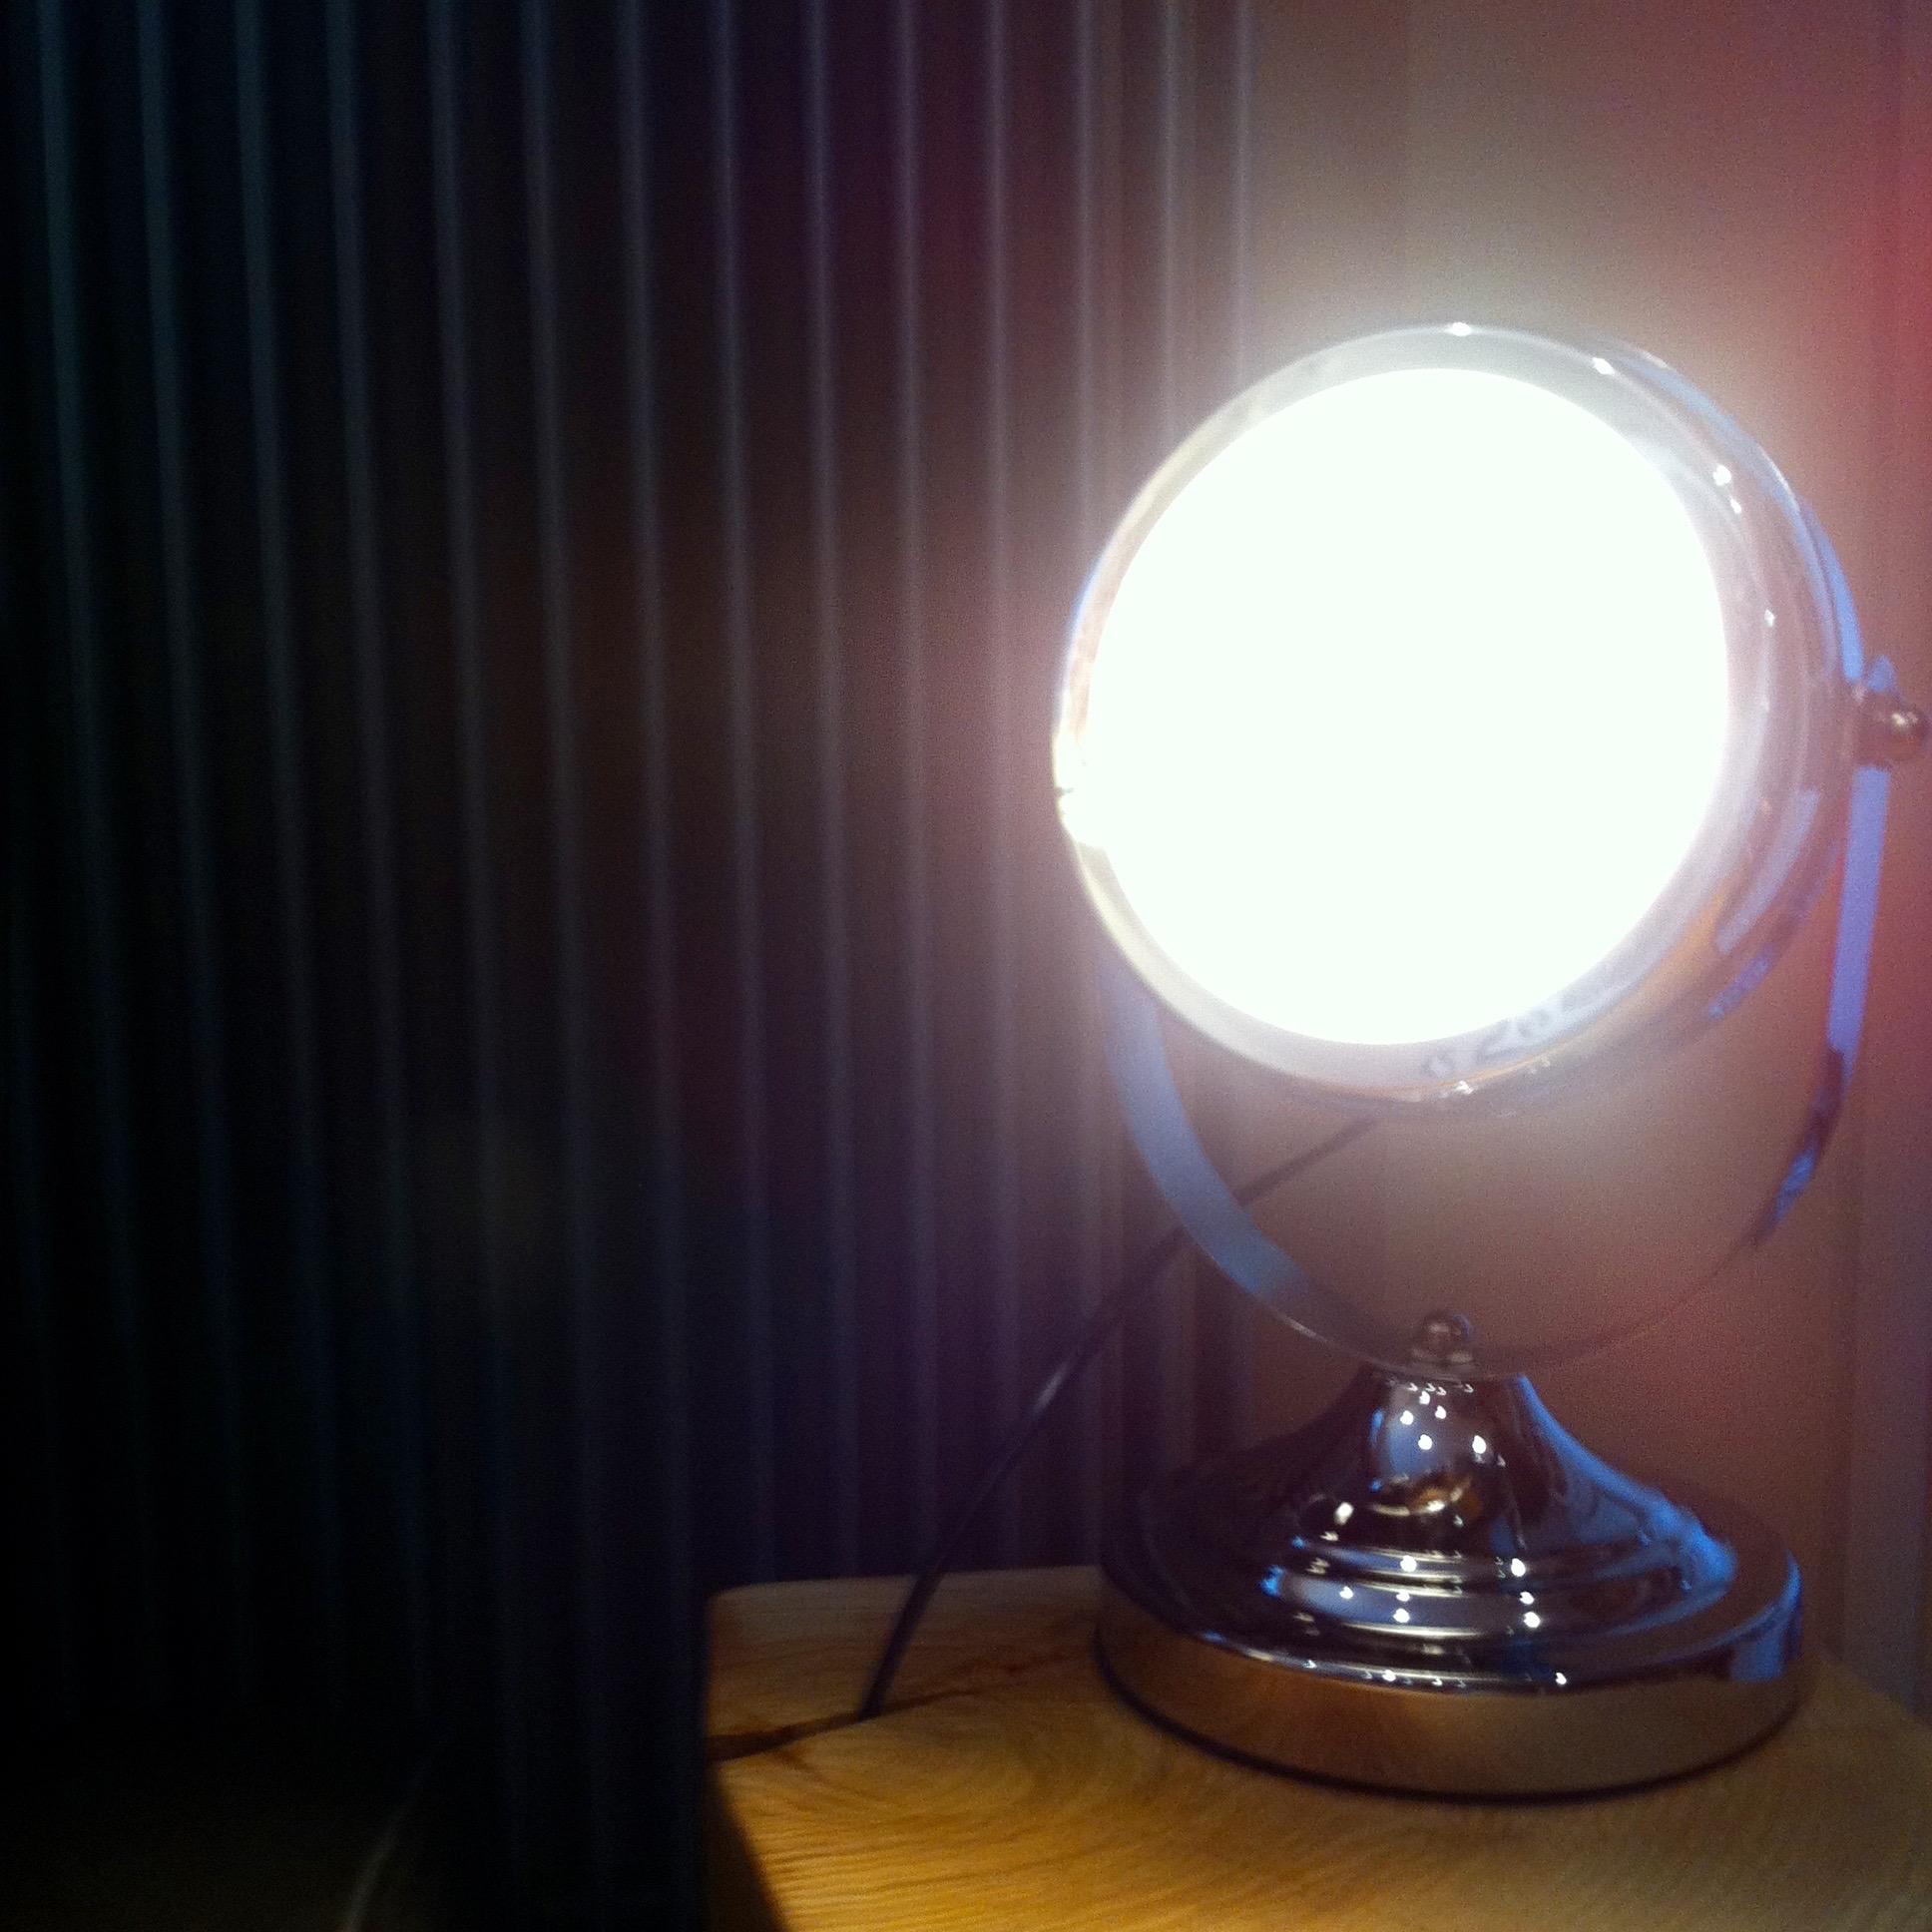 traditionalsteampunklamp.jpg